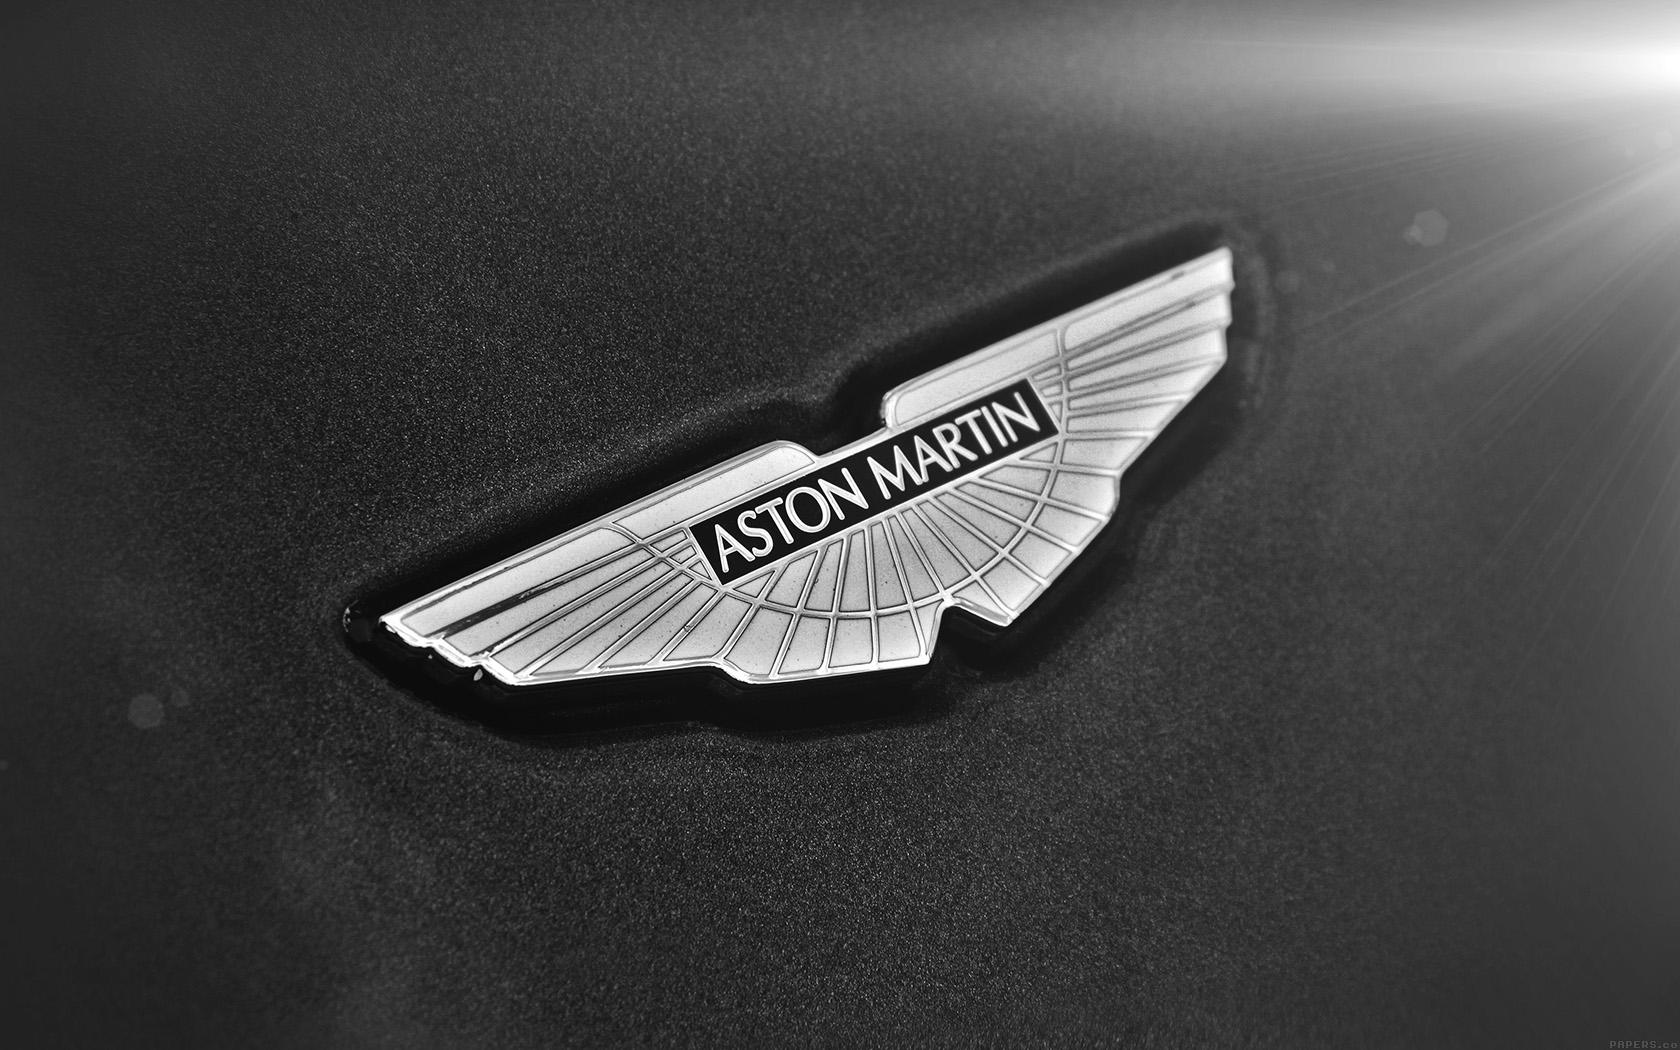 Wallpaper For Desktop Laptop Aj02 Aston Martin Logo Car Bw Dark